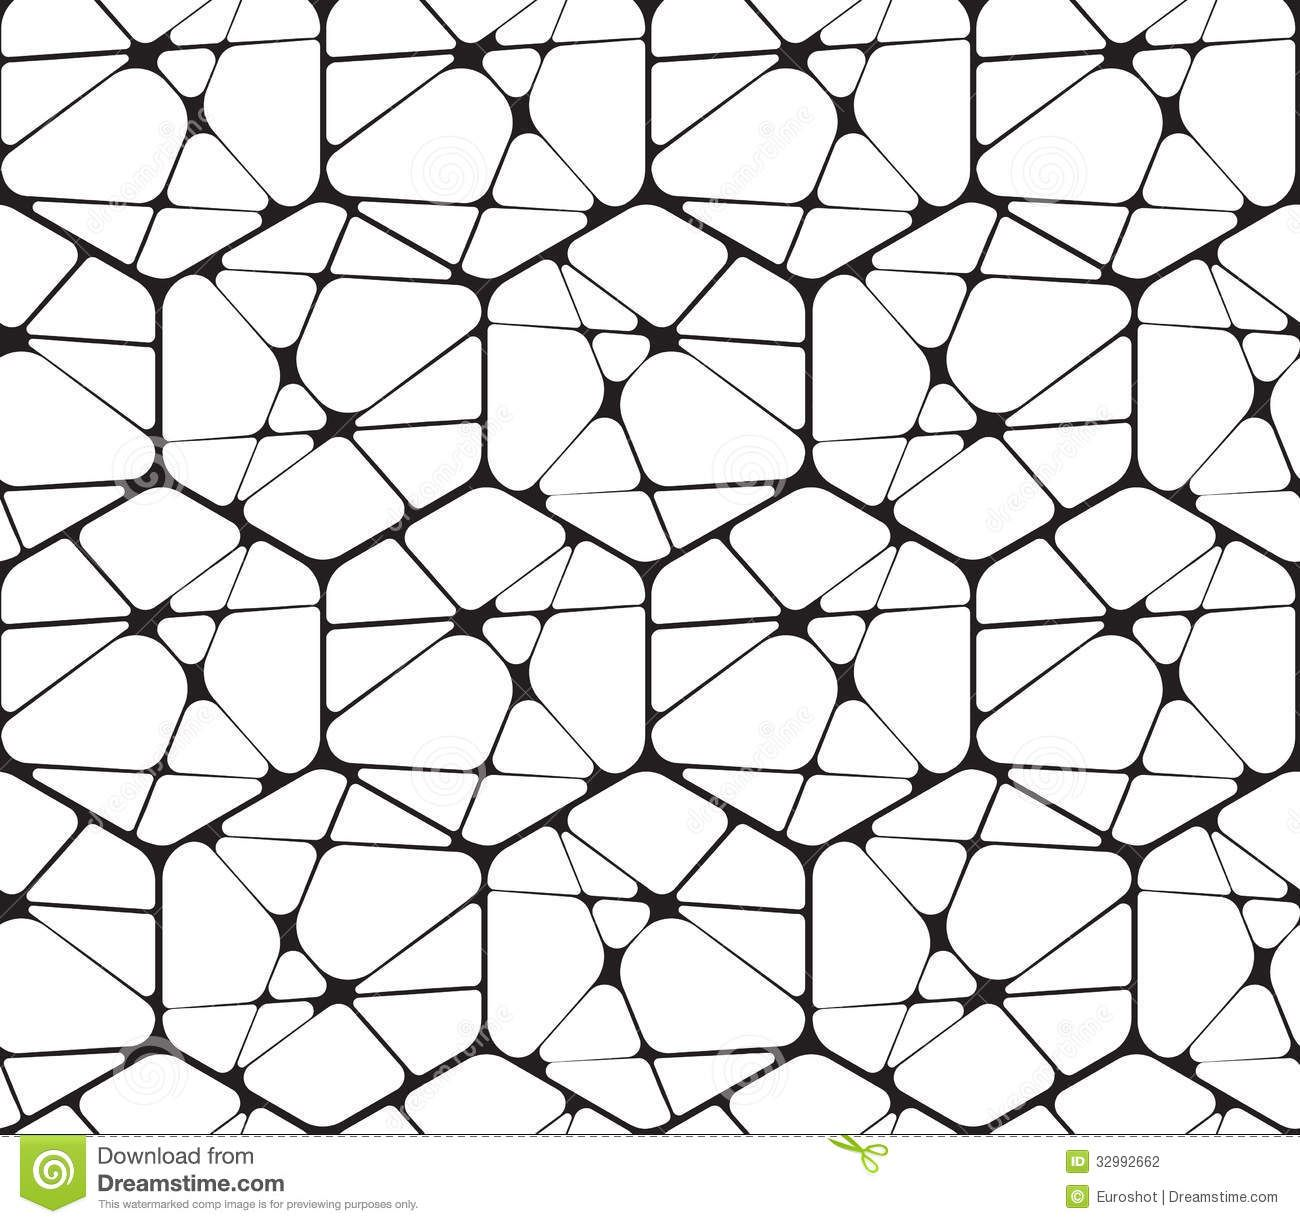 abstract geometric pattern black white - Google zoeken ...